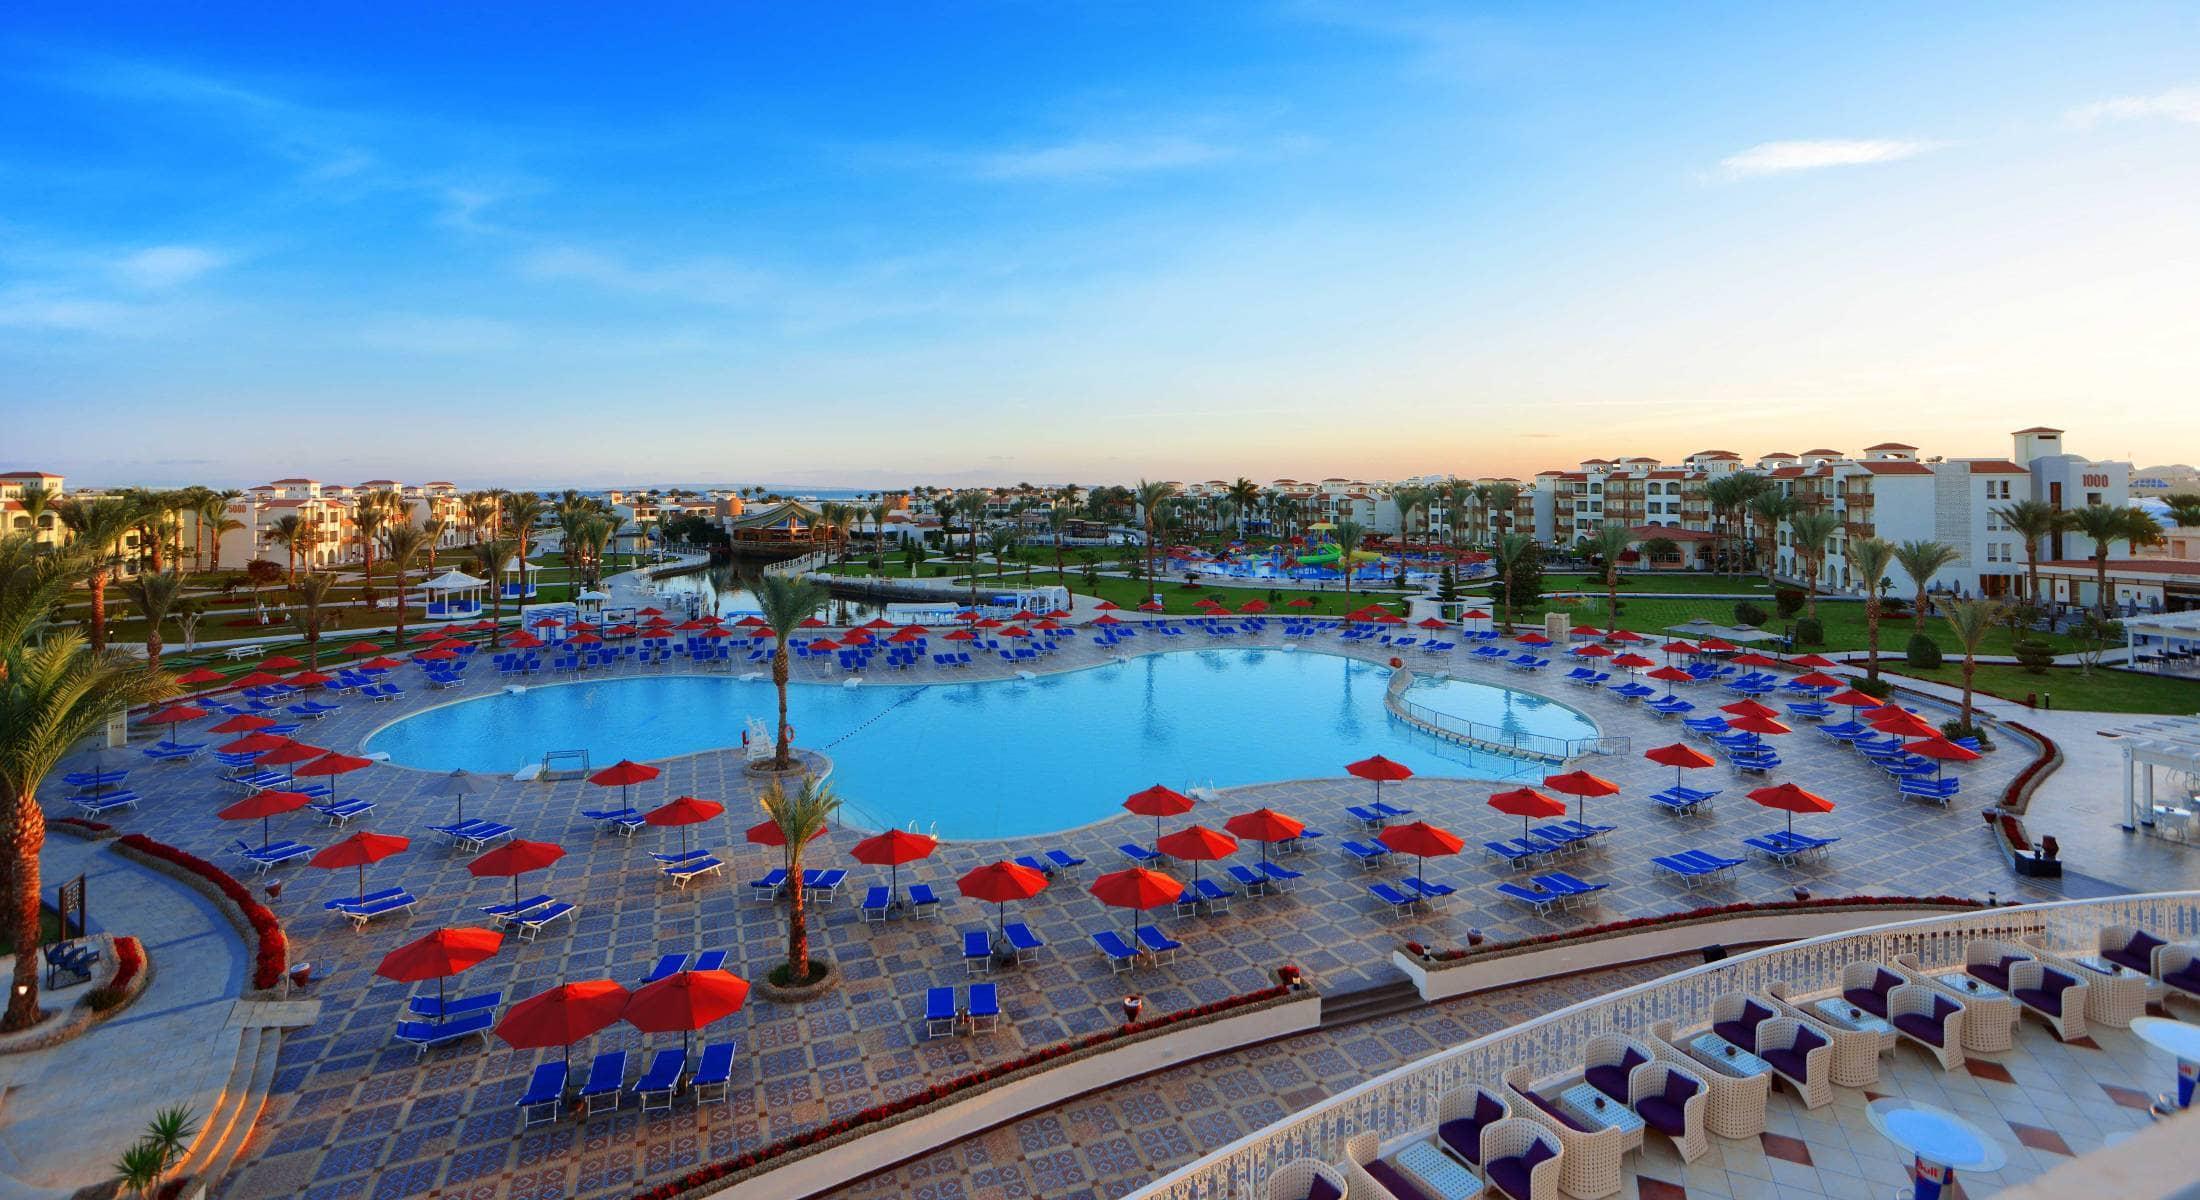 Dana Beach Resort (Pickalbatros)